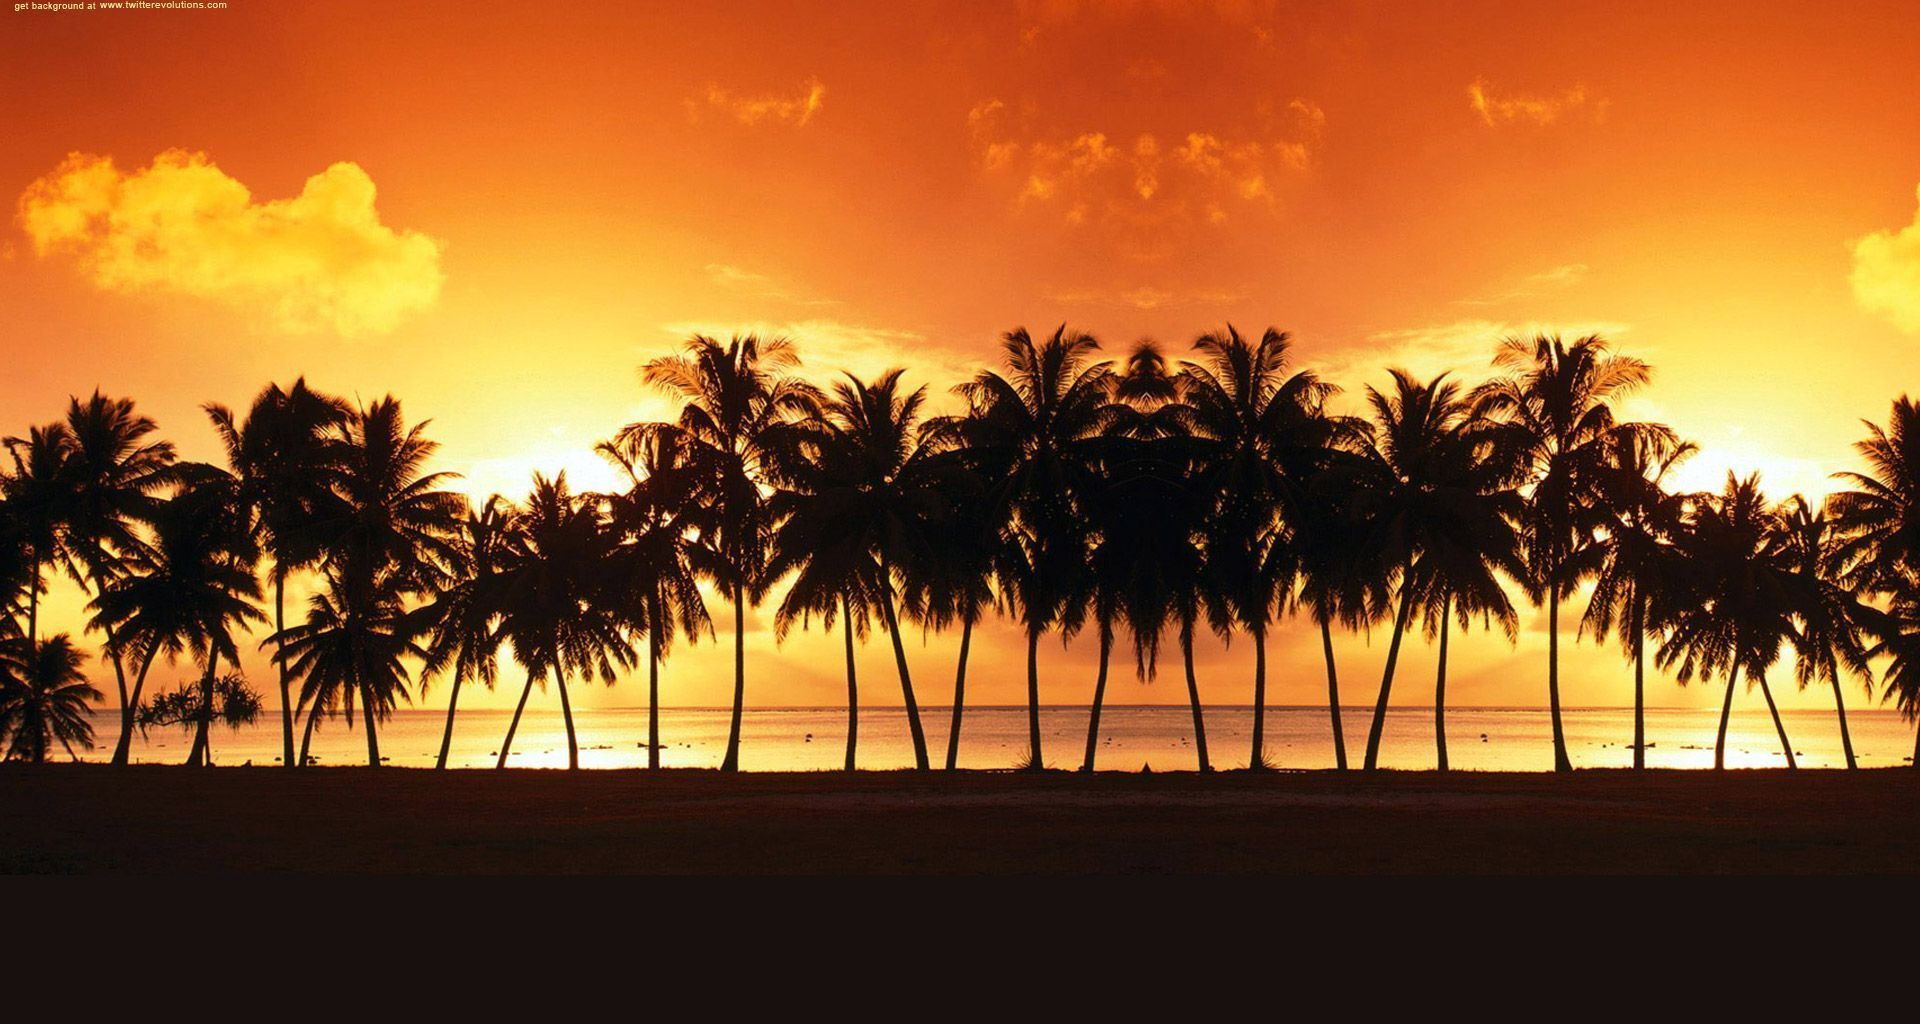 Hd california beach 4k backgrounds california beach voltagebd Image collections